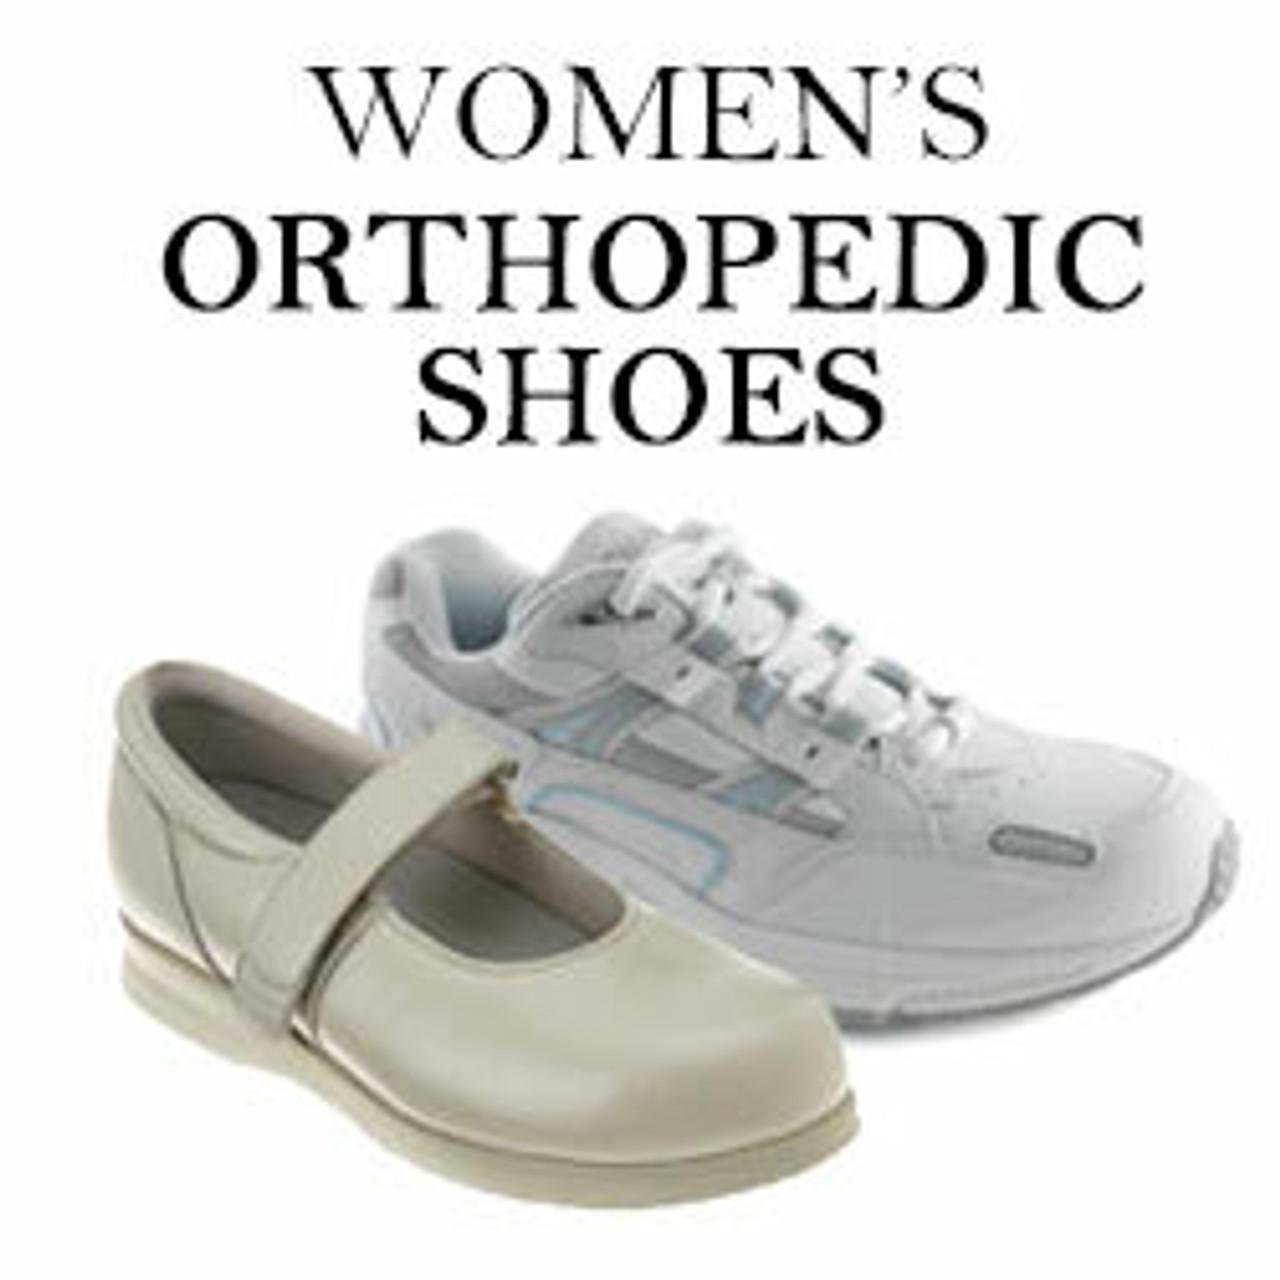 Orthopedic Shoes For Women |  Orthopedic Styles